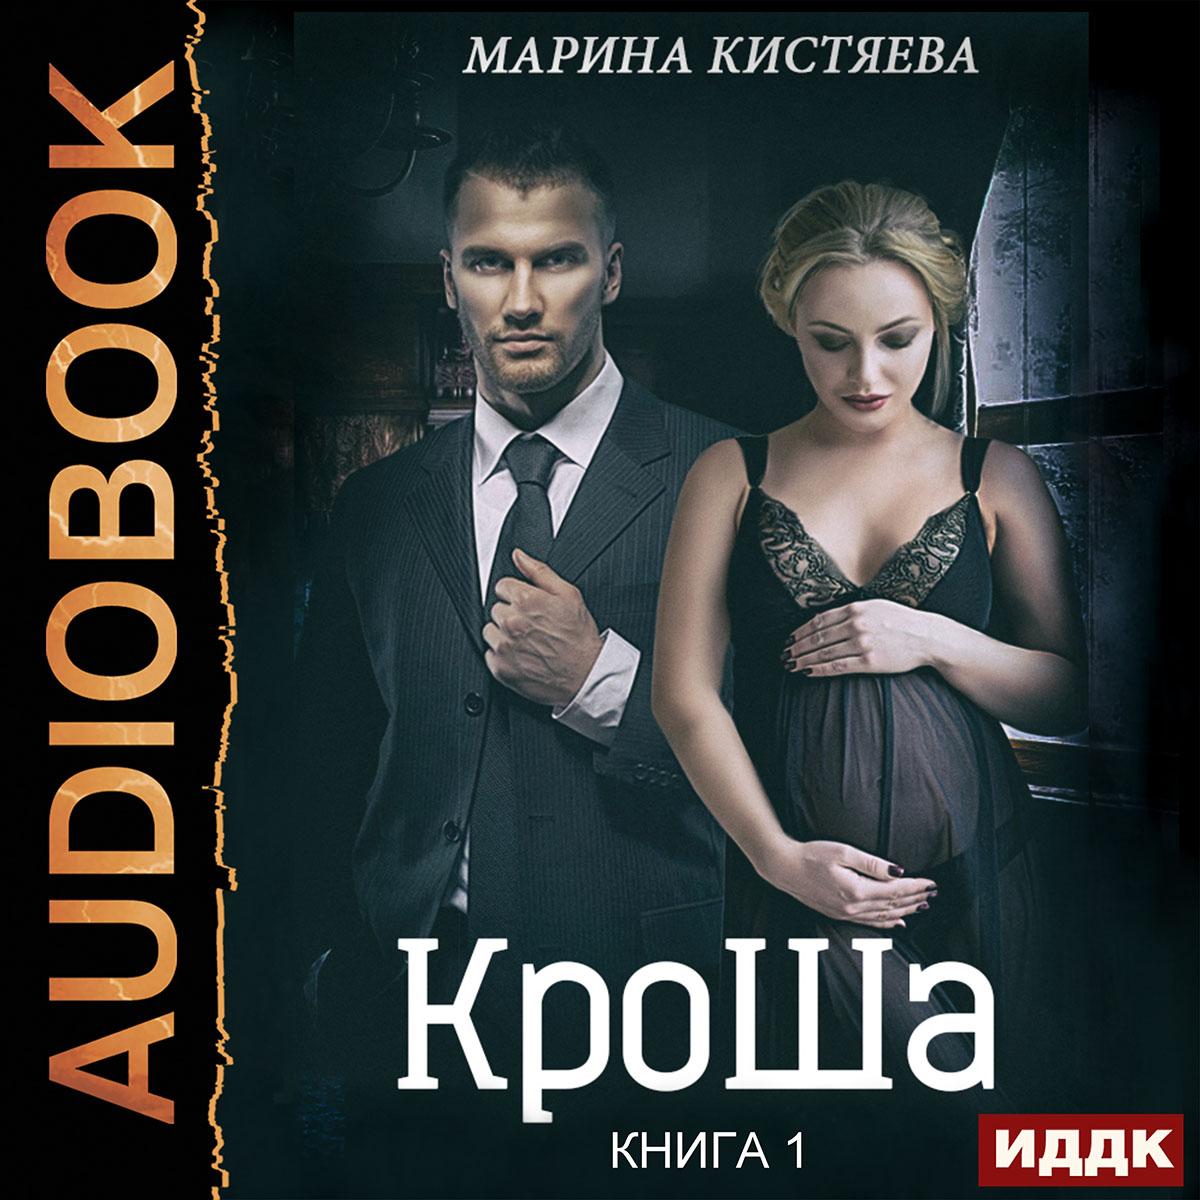 КроШа. Книга 1 (цифровая версия) (Цифровая версия)